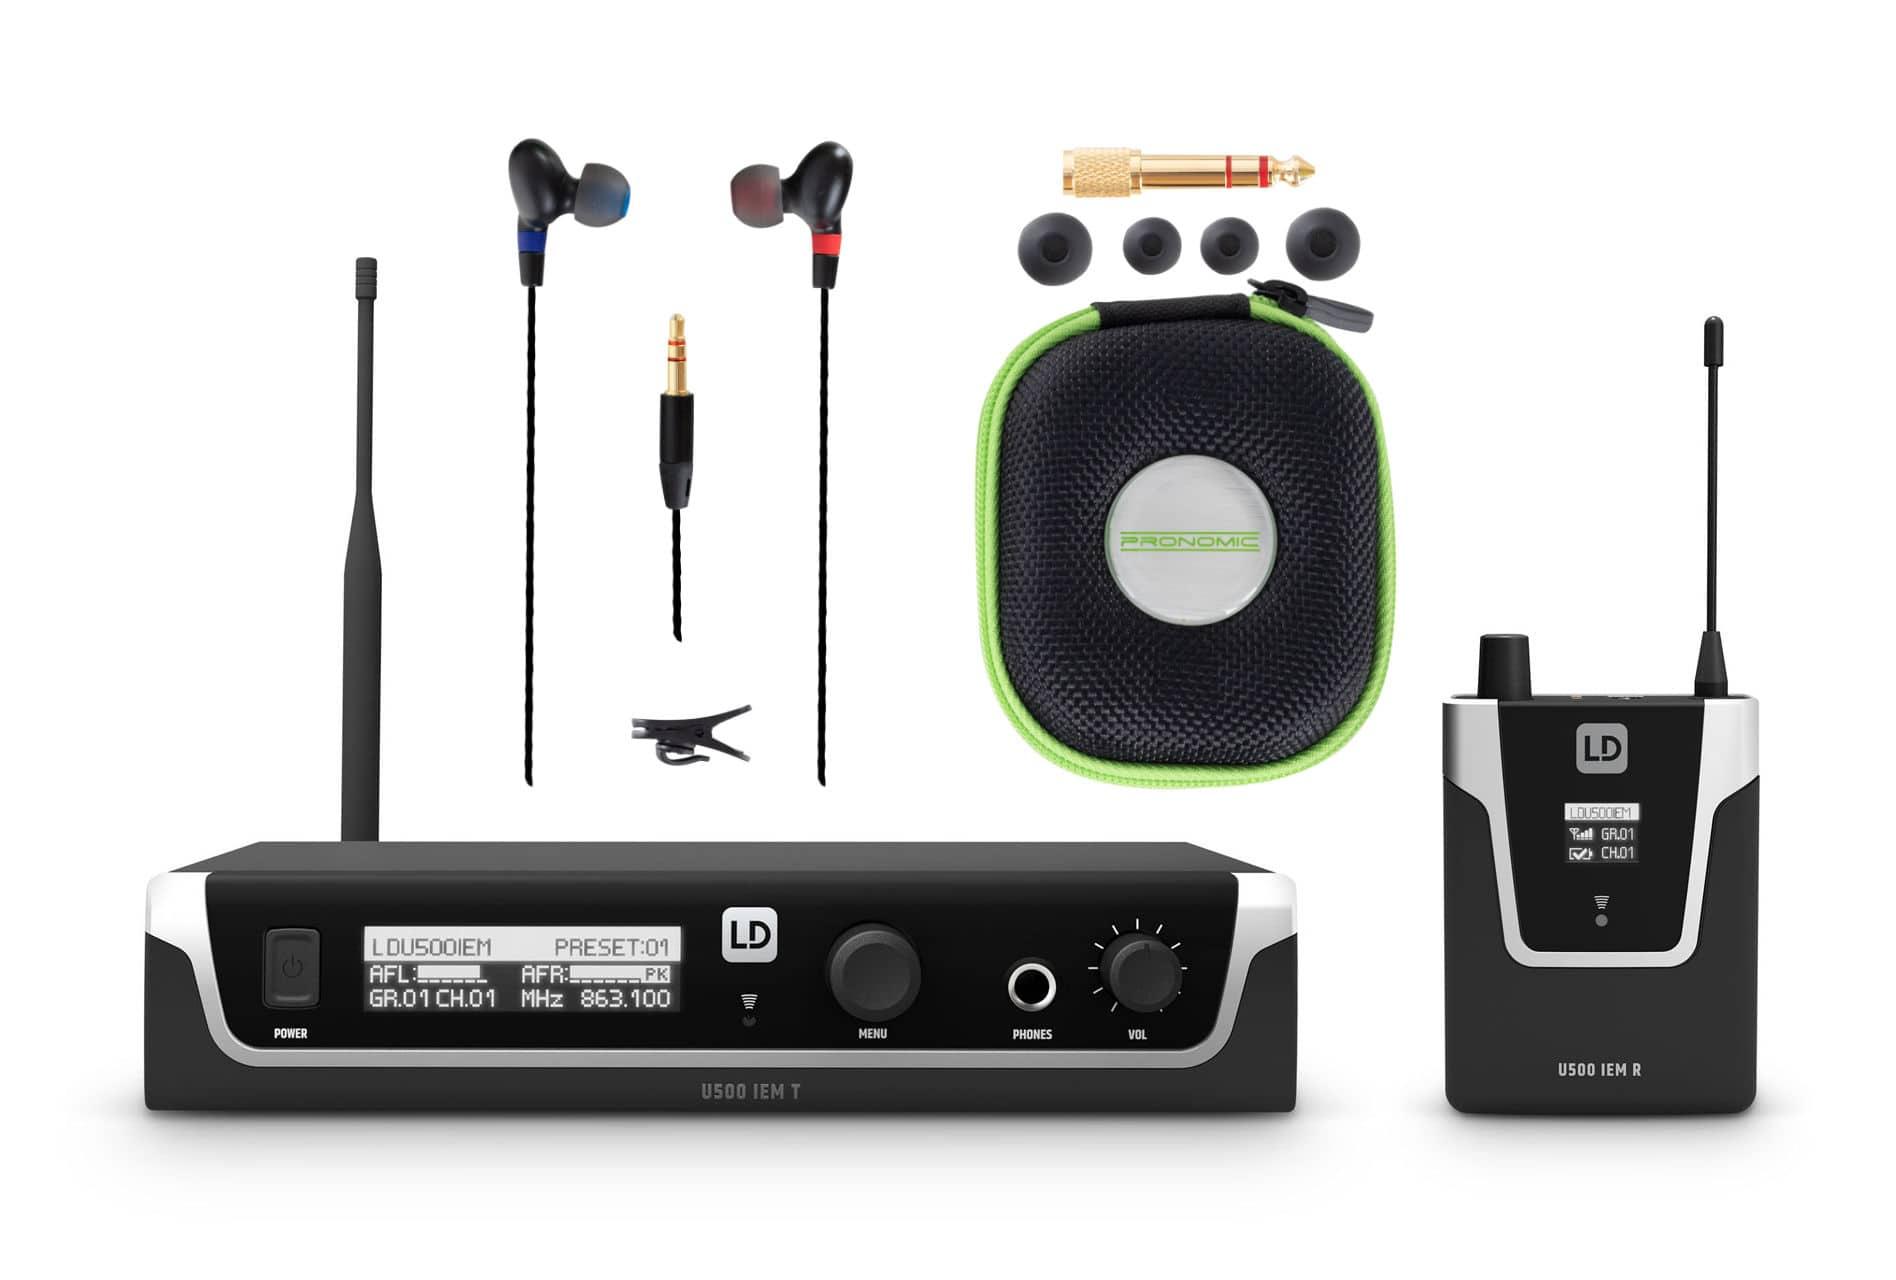 Drahtlossysteme - LD Systems U508 IEM In Ear Monitoring System Set 2 - Onlineshop Musikhaus Kirstein